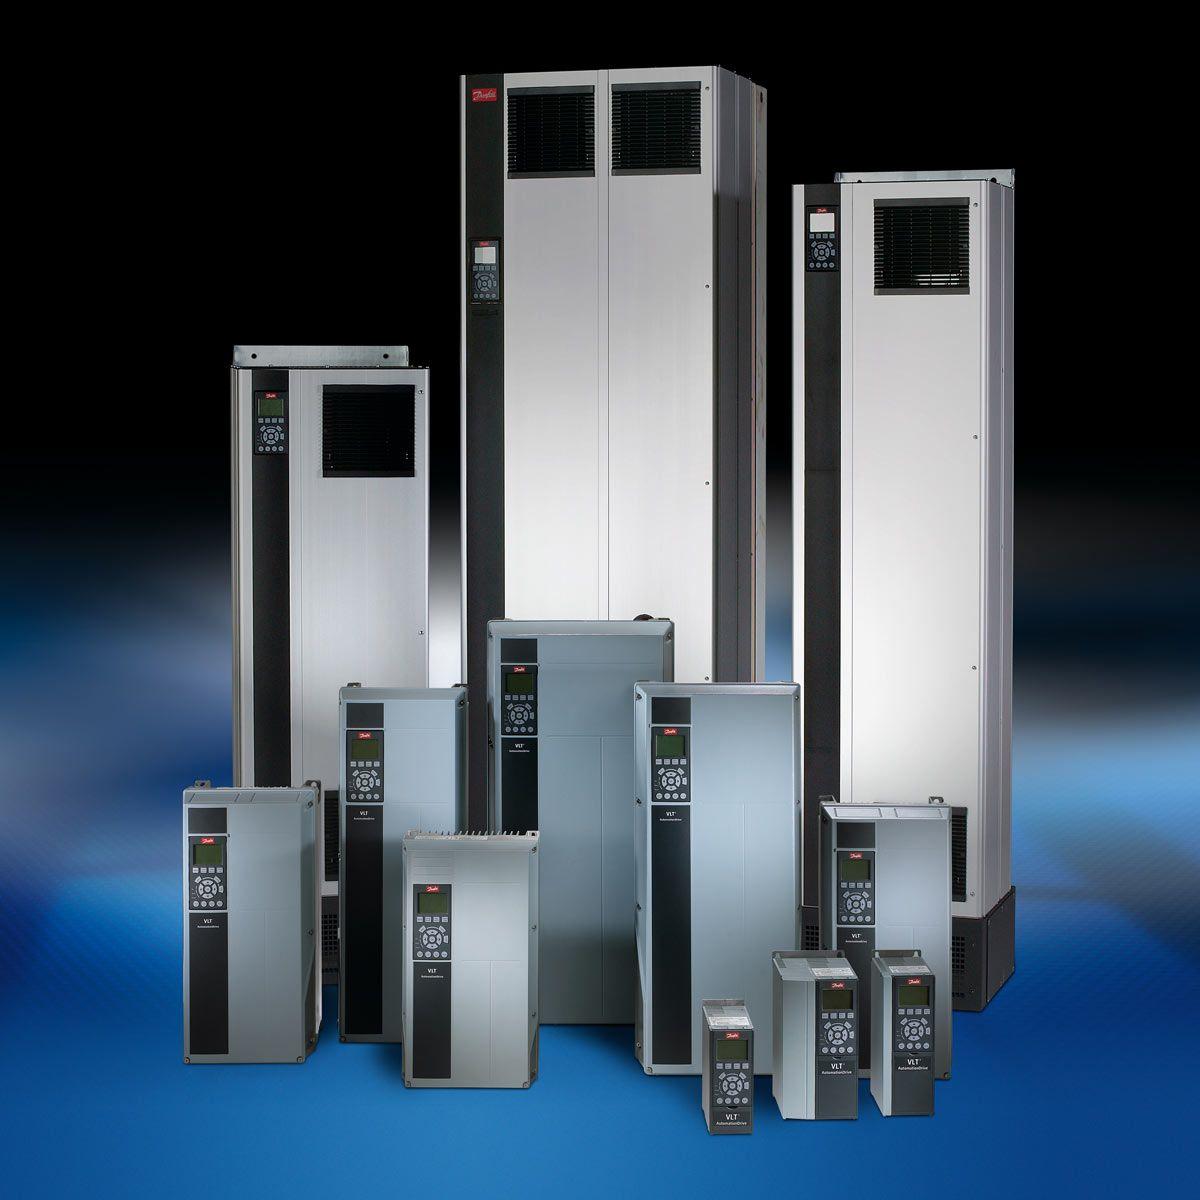 The Danfoss VLT AutomationDrive FC302.